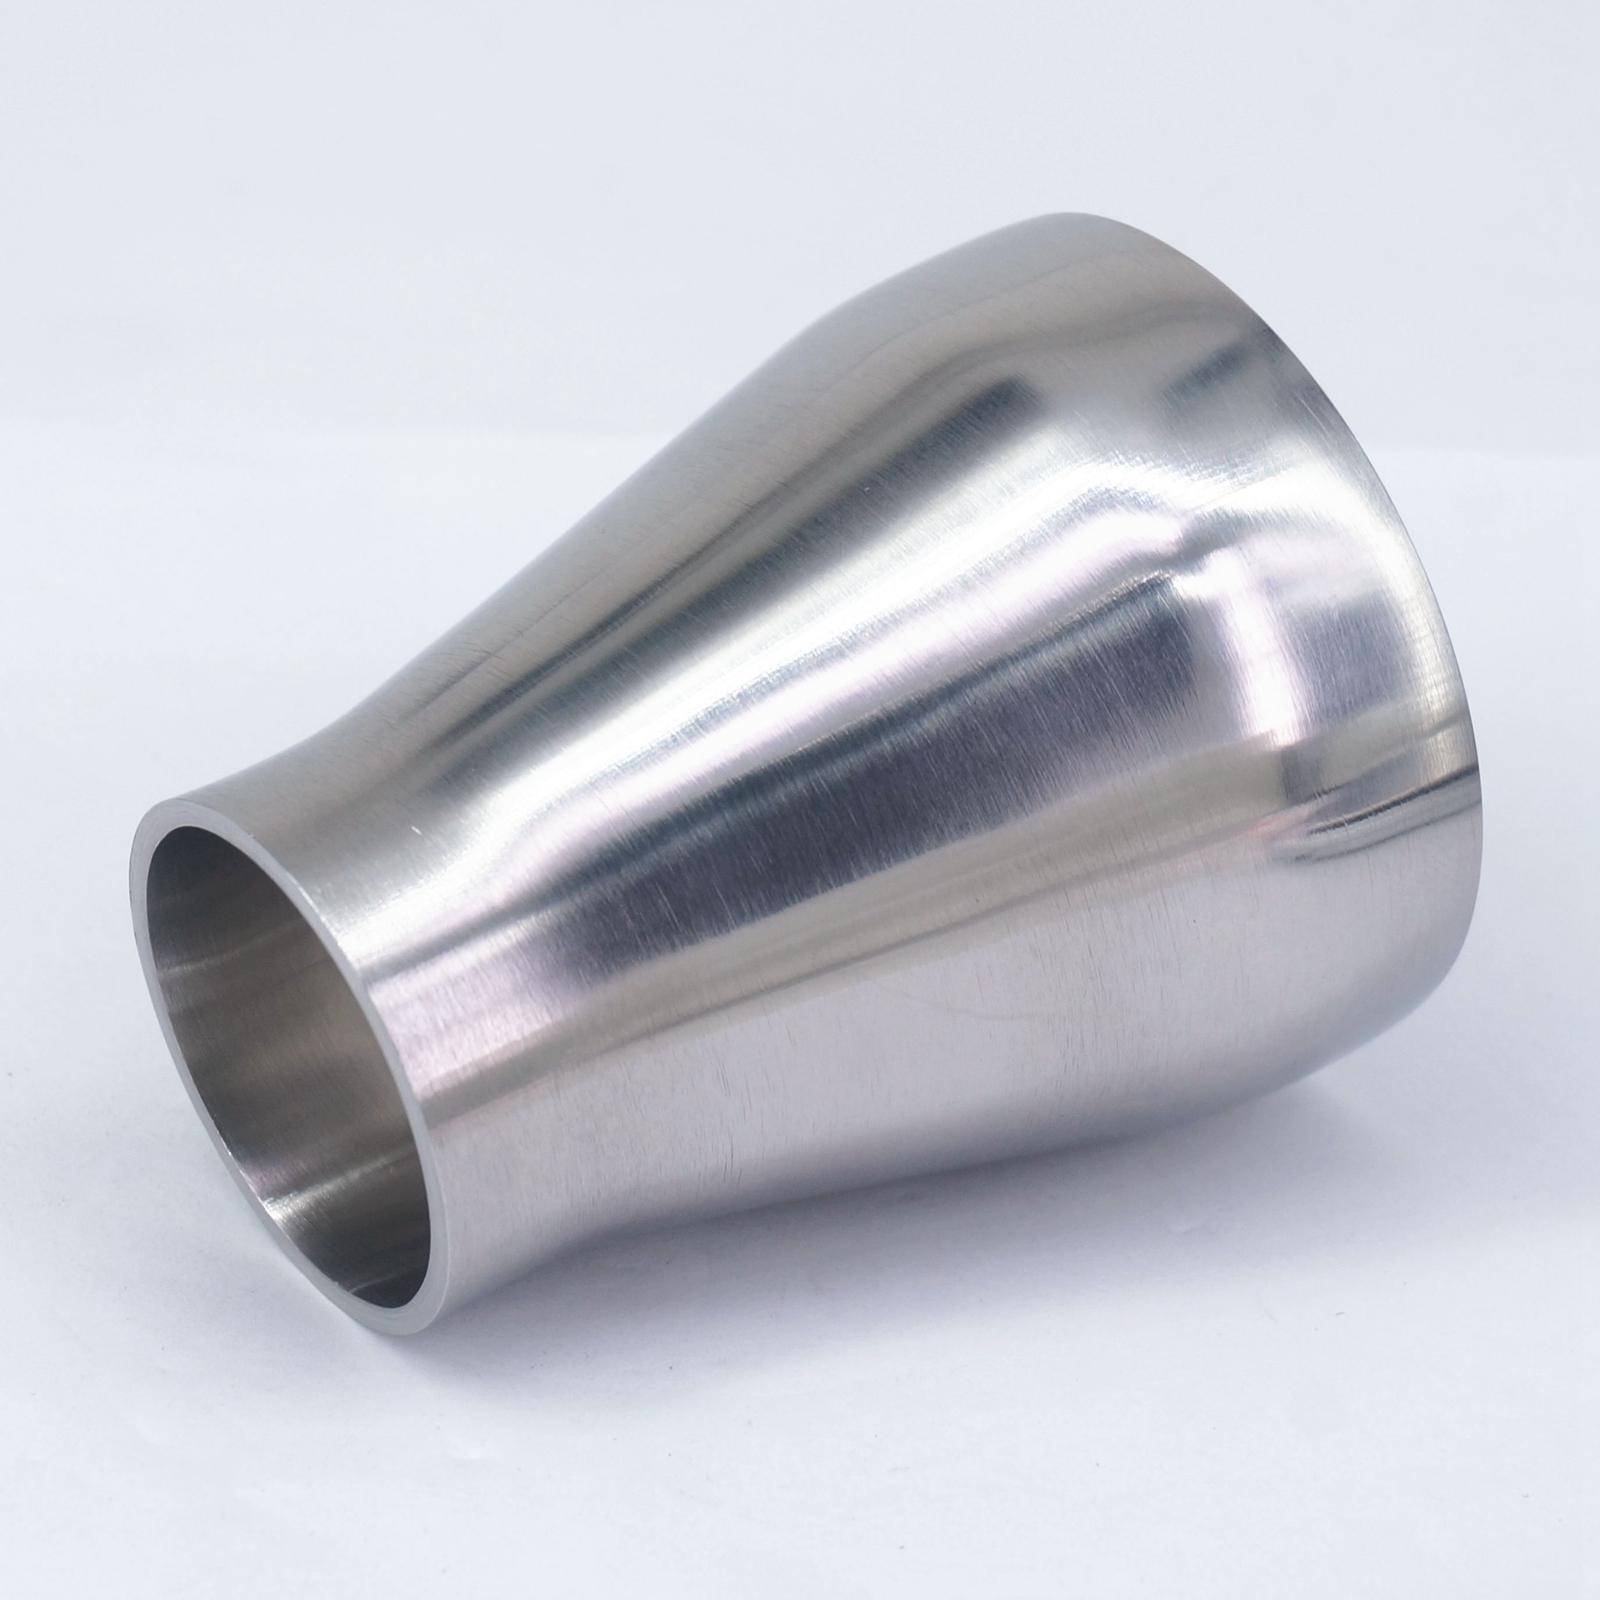 63mm 2.5